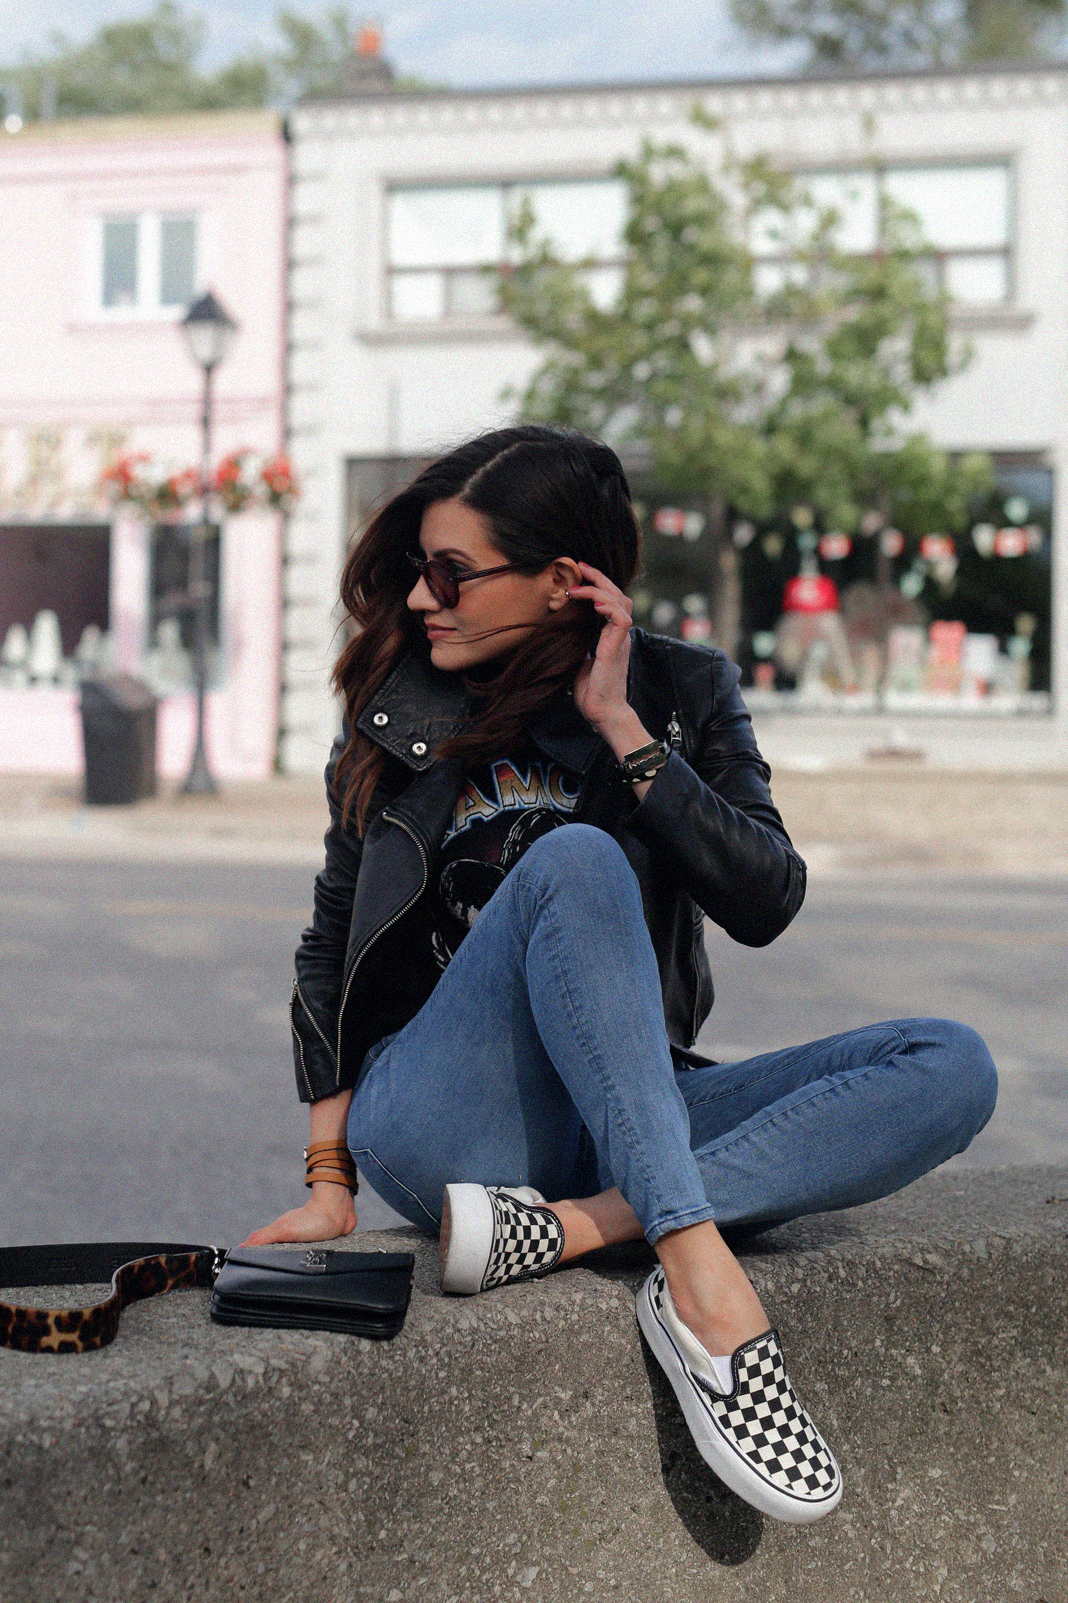 saint laurent black monogram crossbody bag, vans checkerboard platform slip ons, 3x1 skinny jeans, lether jacket_1161.JPG